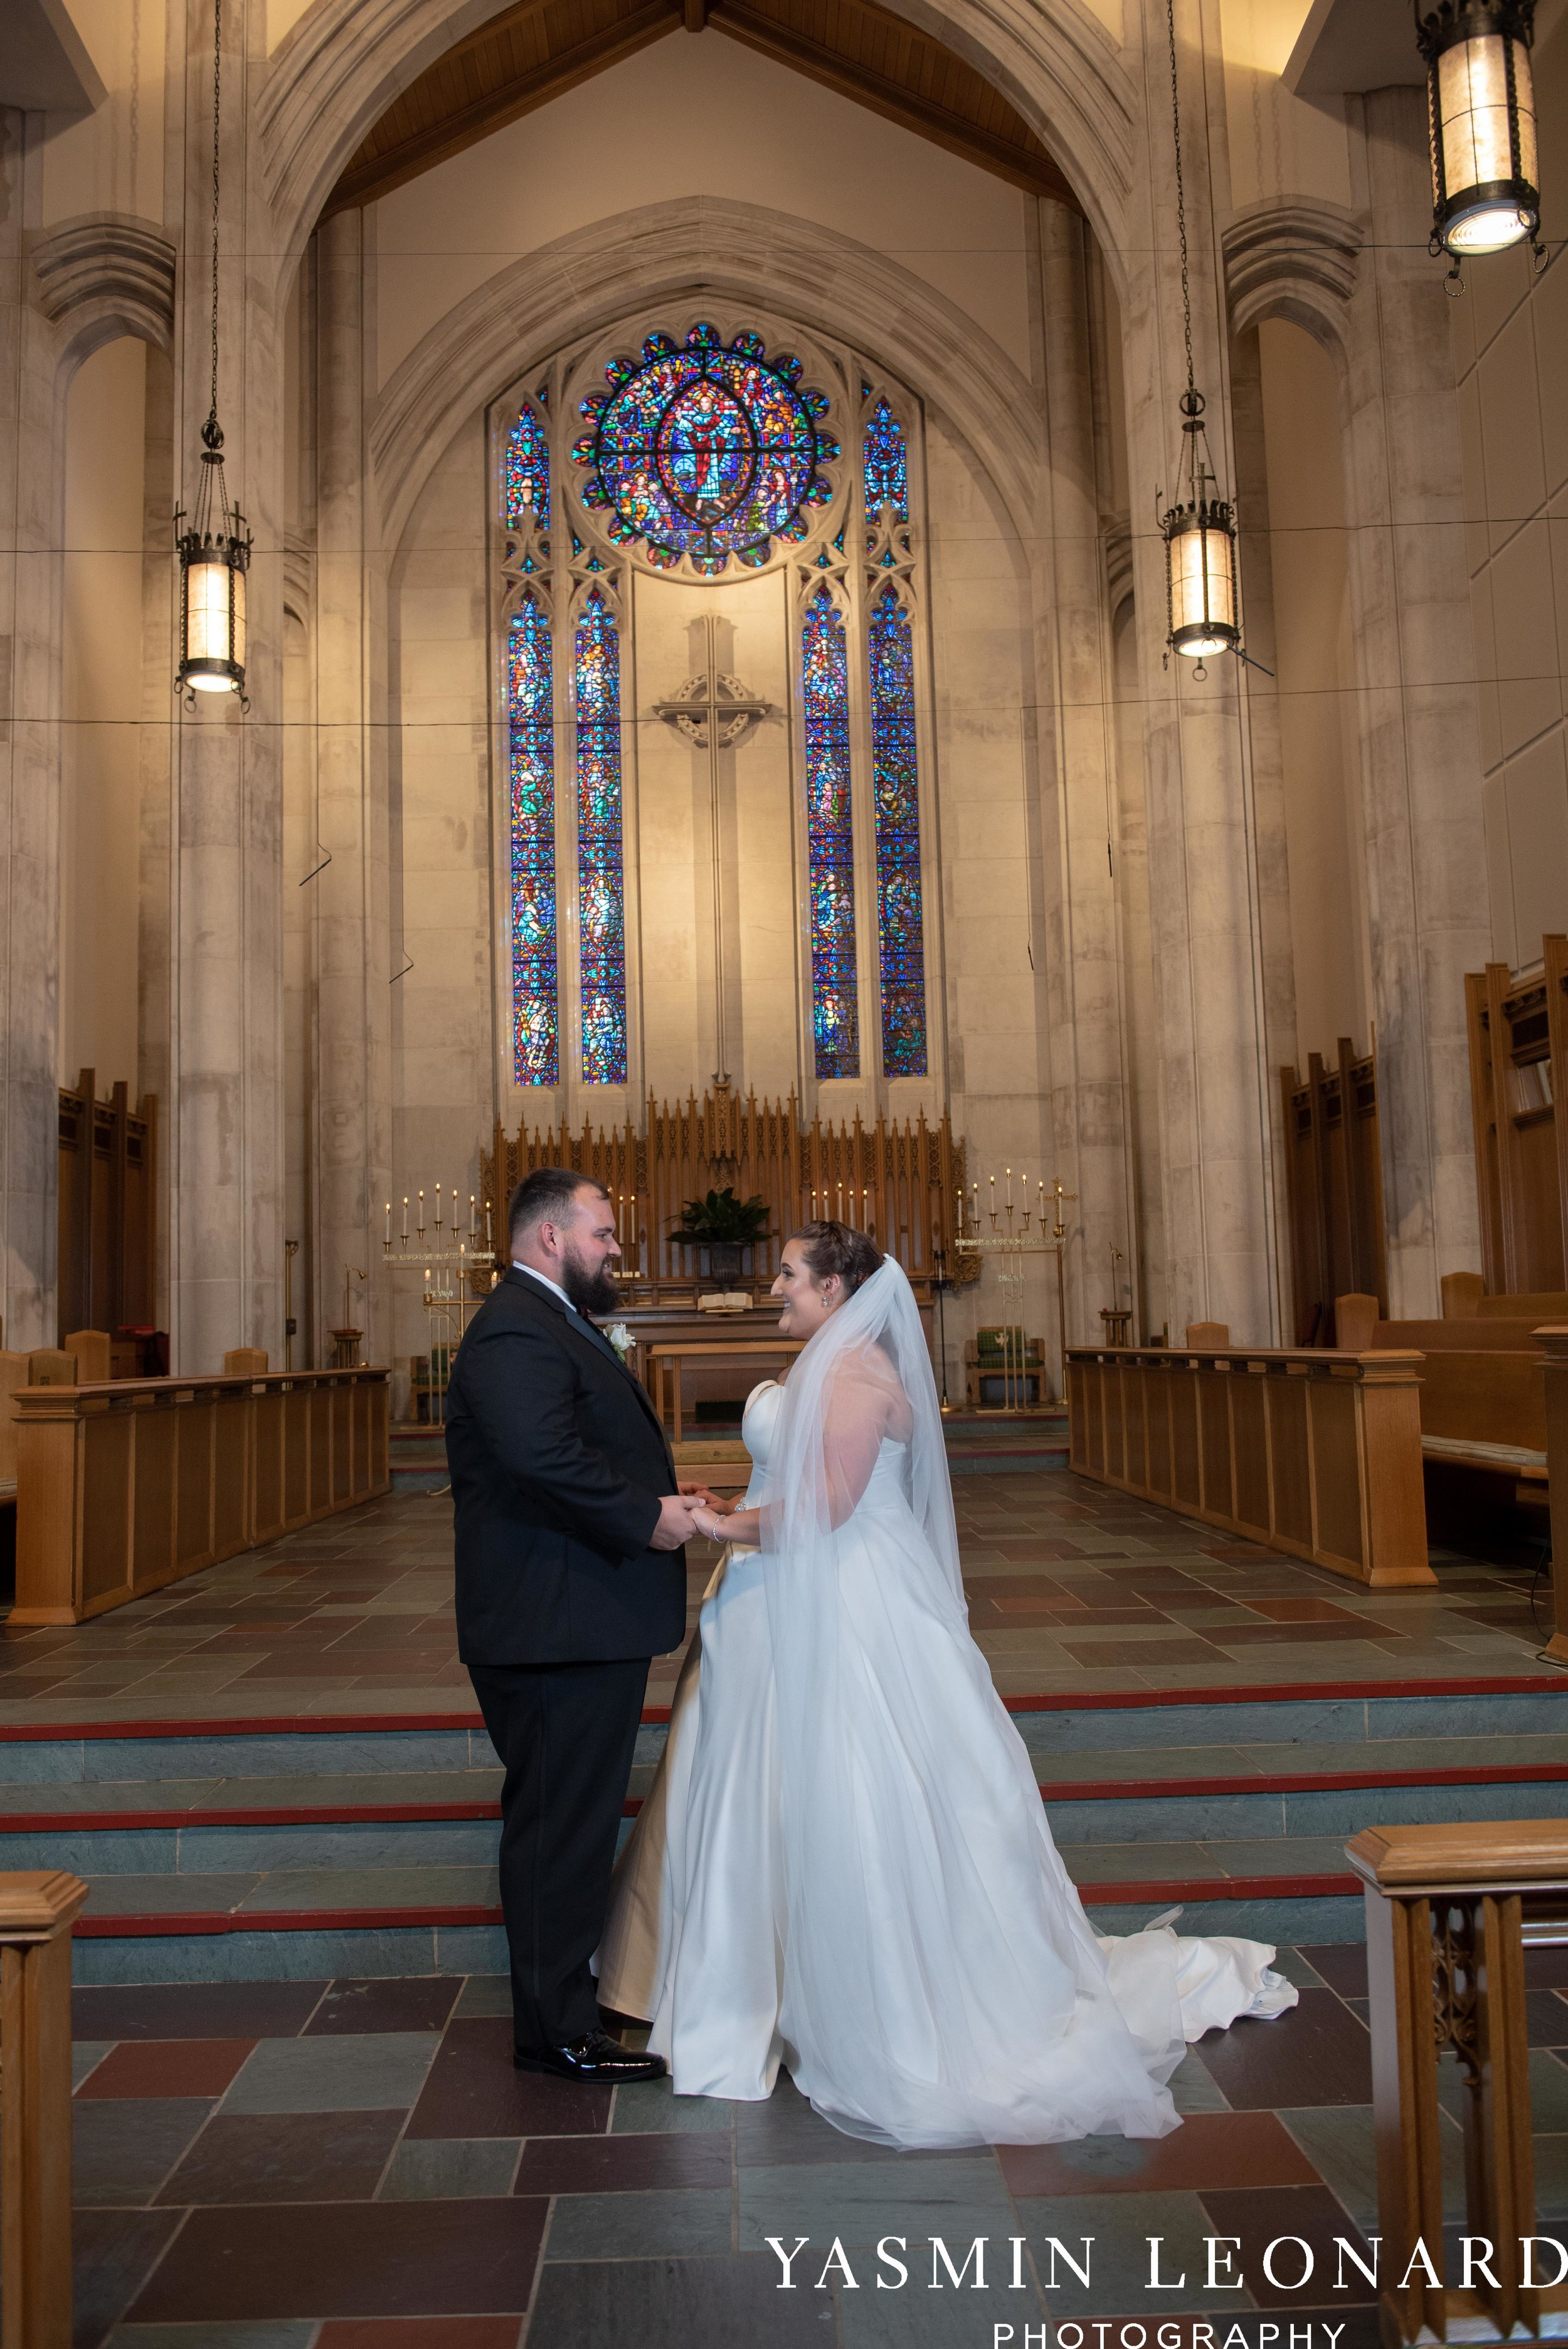 Wesley Memorial United Methodist Church - Old Homeplace Winery - High Point Weddings - High Point Wedding Photographer - NC Weddings - NC Barn Venue - Yasmin Leonard Photography-22.jpg